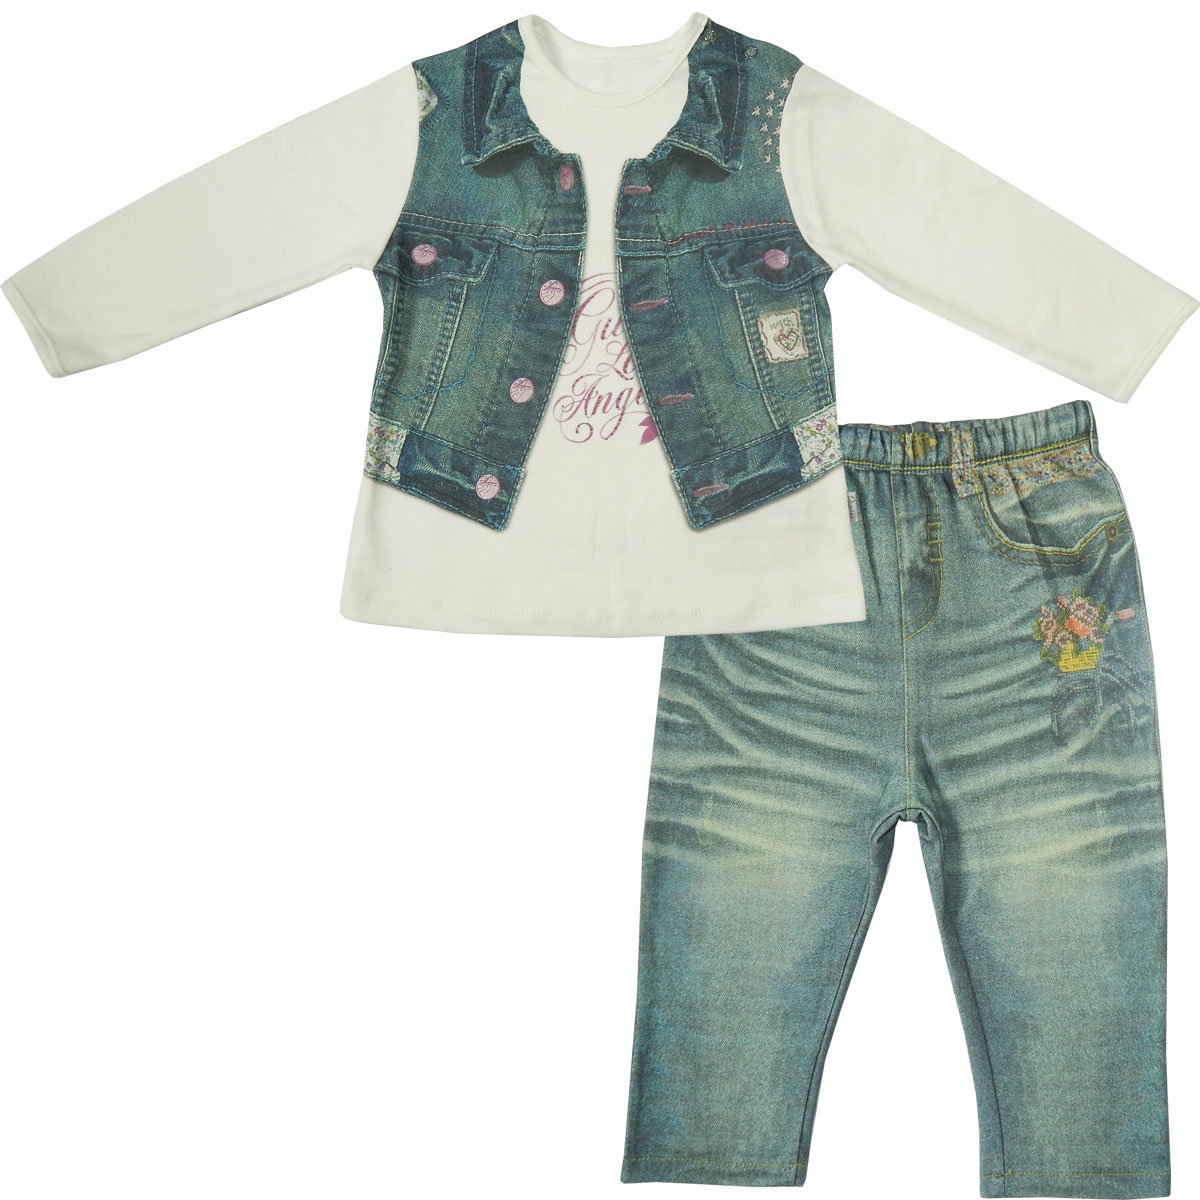 Комплект одежды Папитто для девочки Fashion Jeans 593-05 белый/синий р.26-92